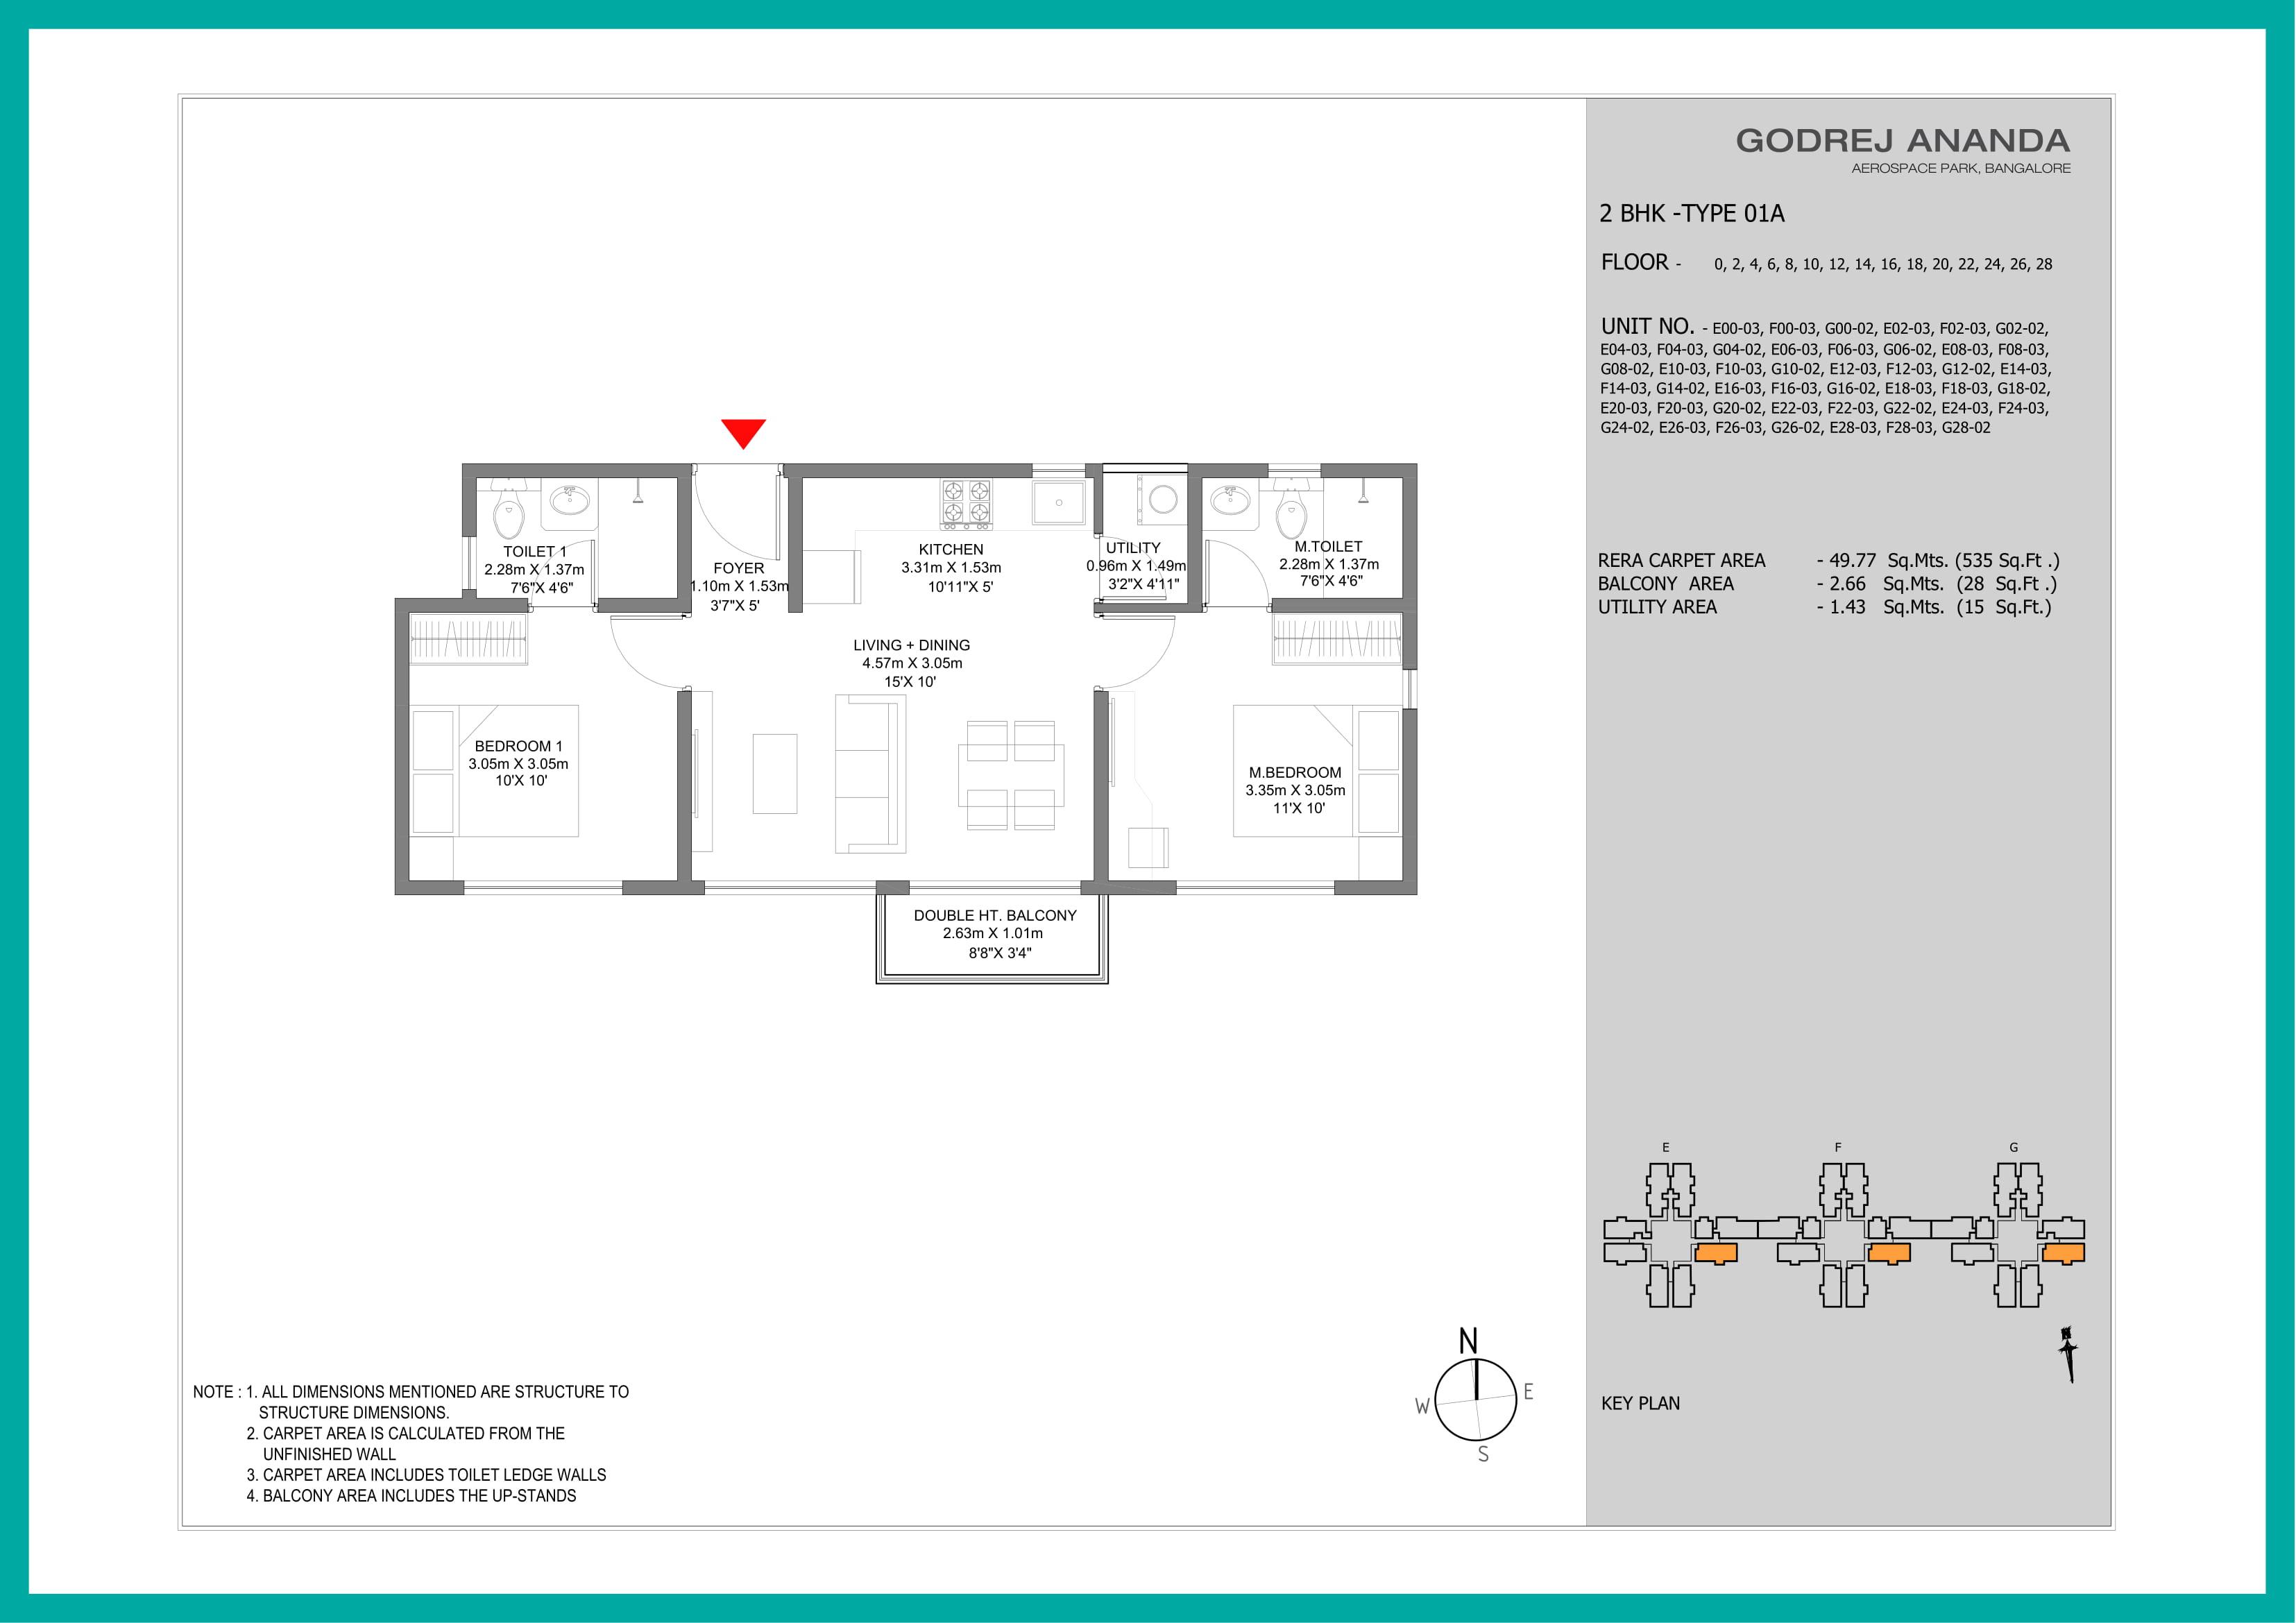 Floor Plan Godrej Ananda Bangalore